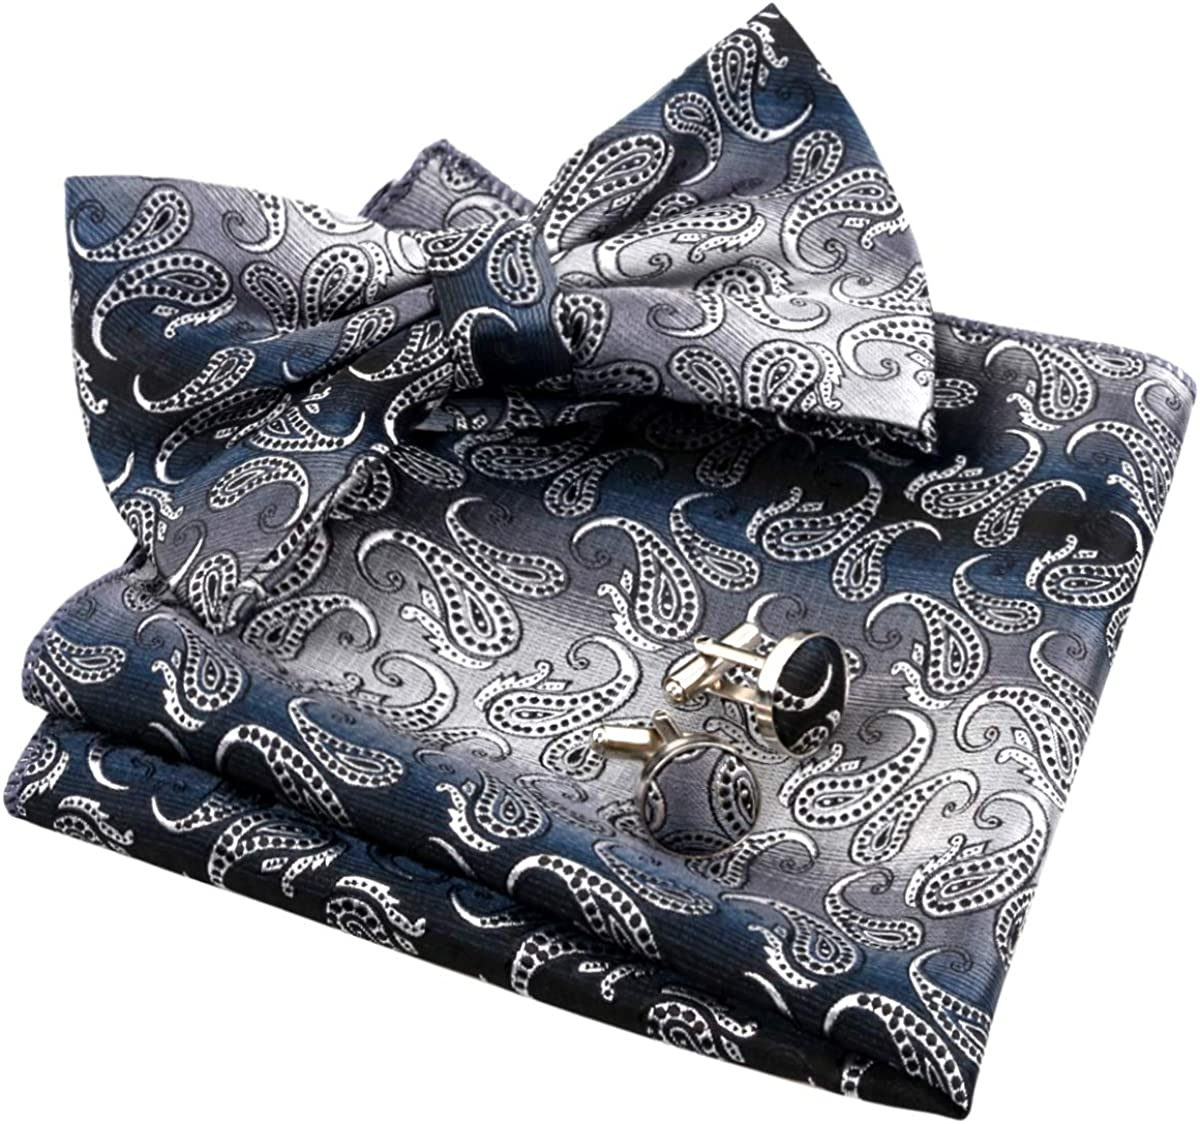 Hot Sale Men Cufflinks Blue Gradienter Cuff Links With Gift Box